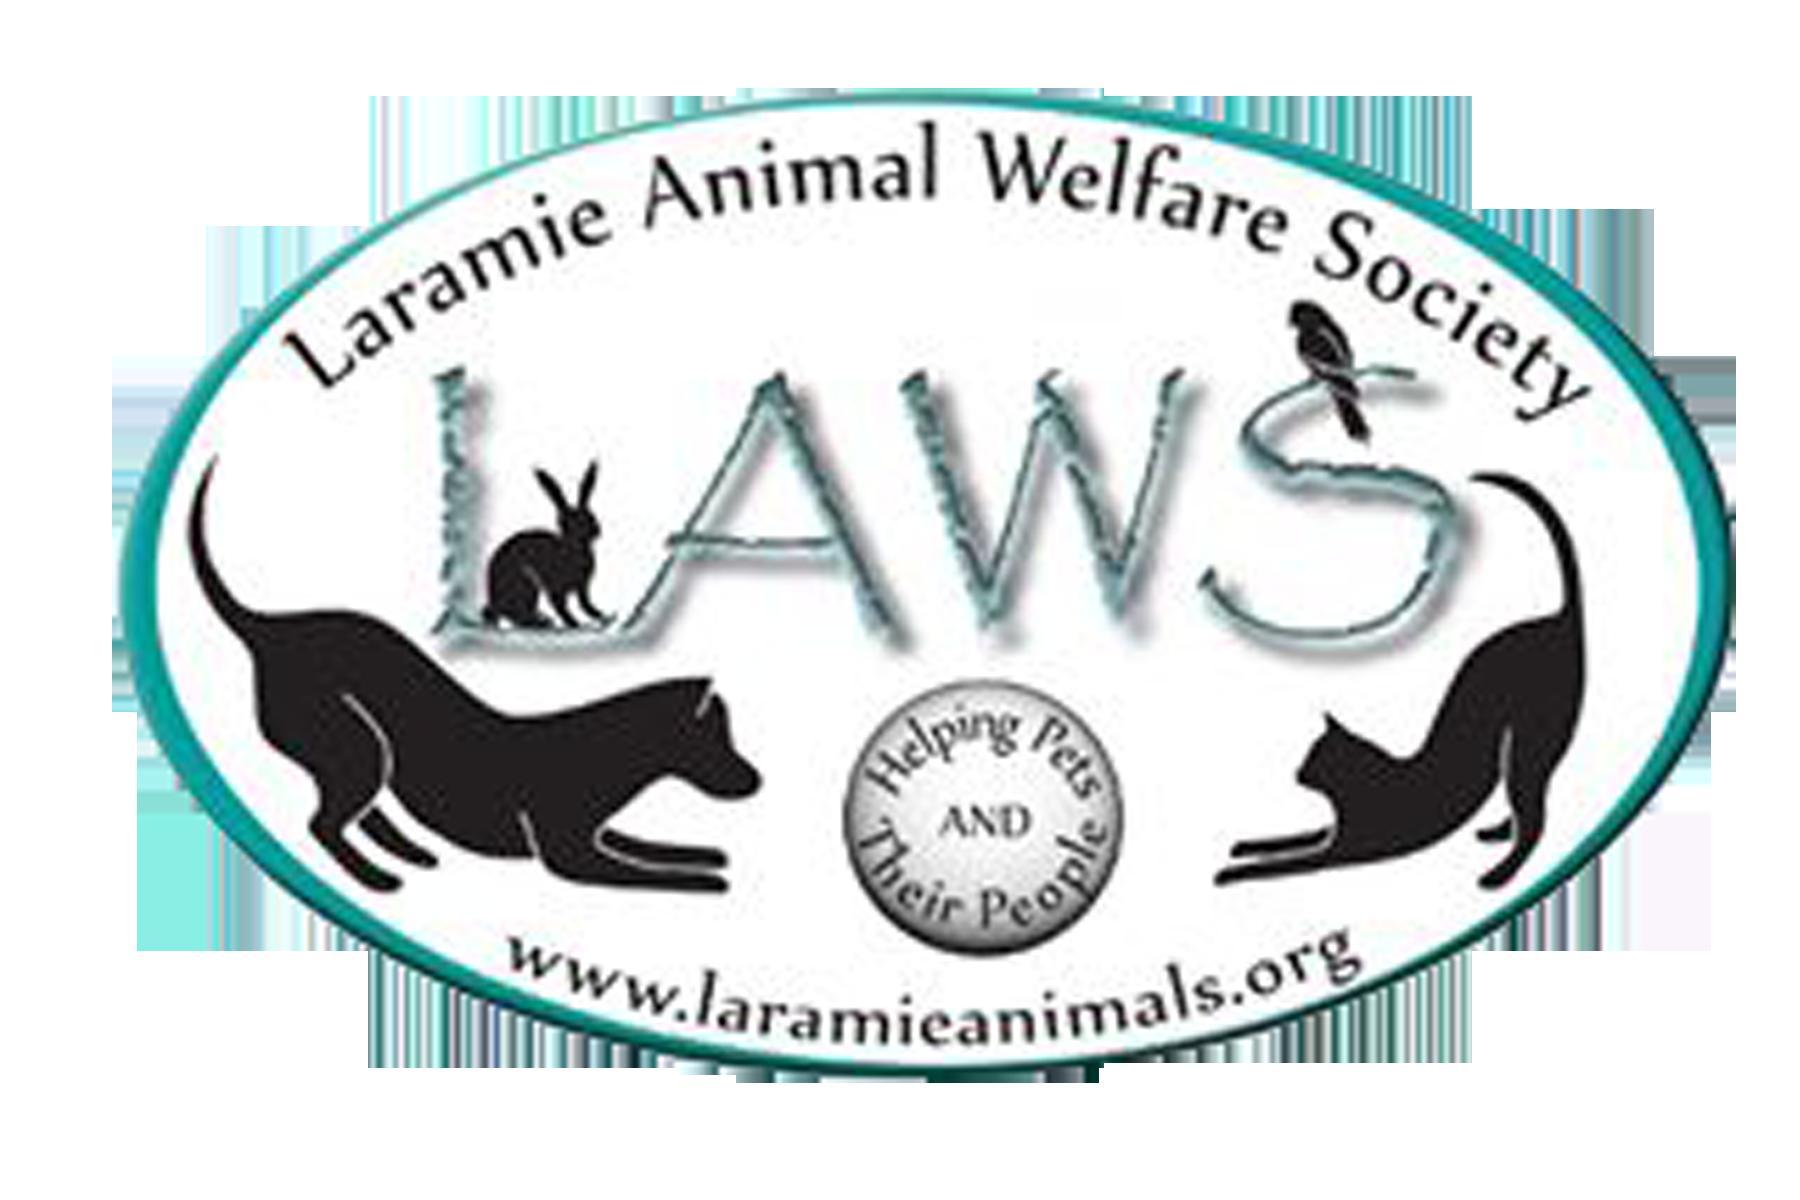 Laramie Animal Welfare Society